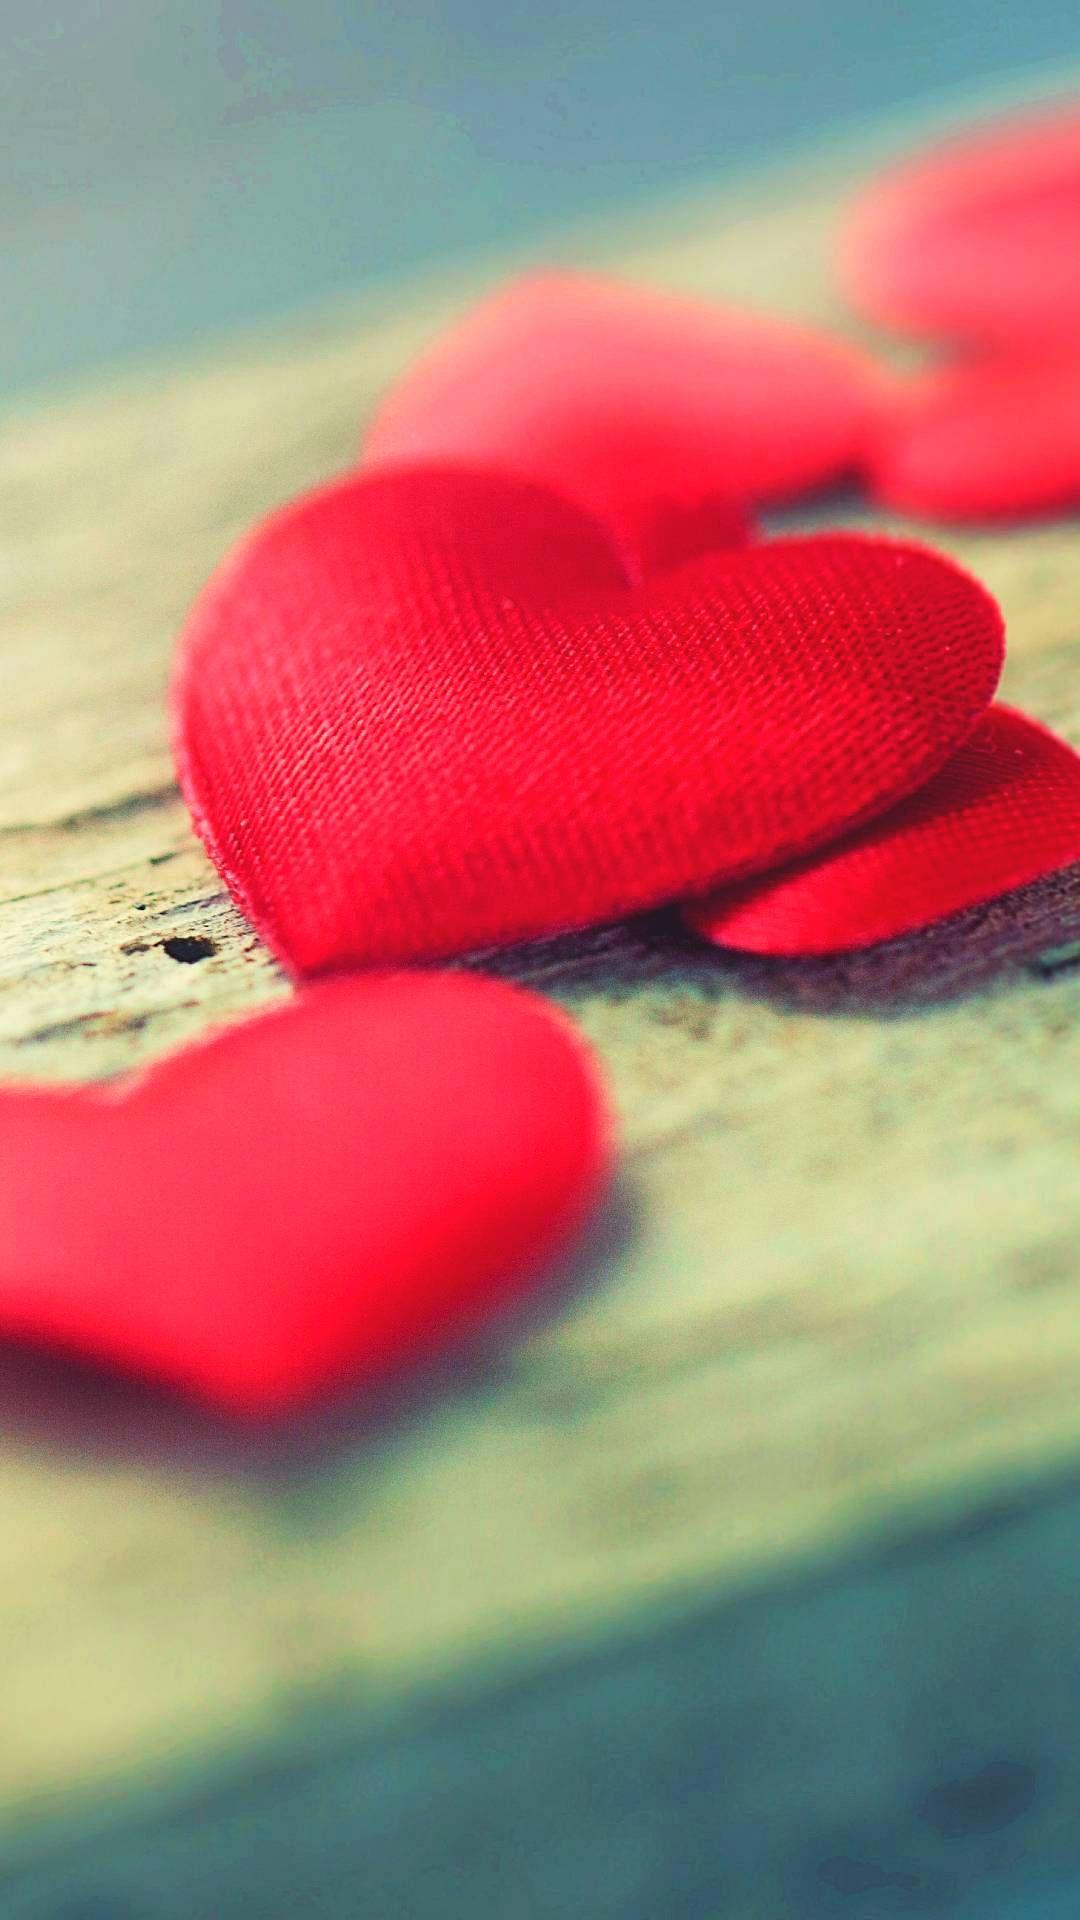 Red Heart Love Hd Wallpapers 1080x1920 Red Heart Love Wallpaper Wallpaper